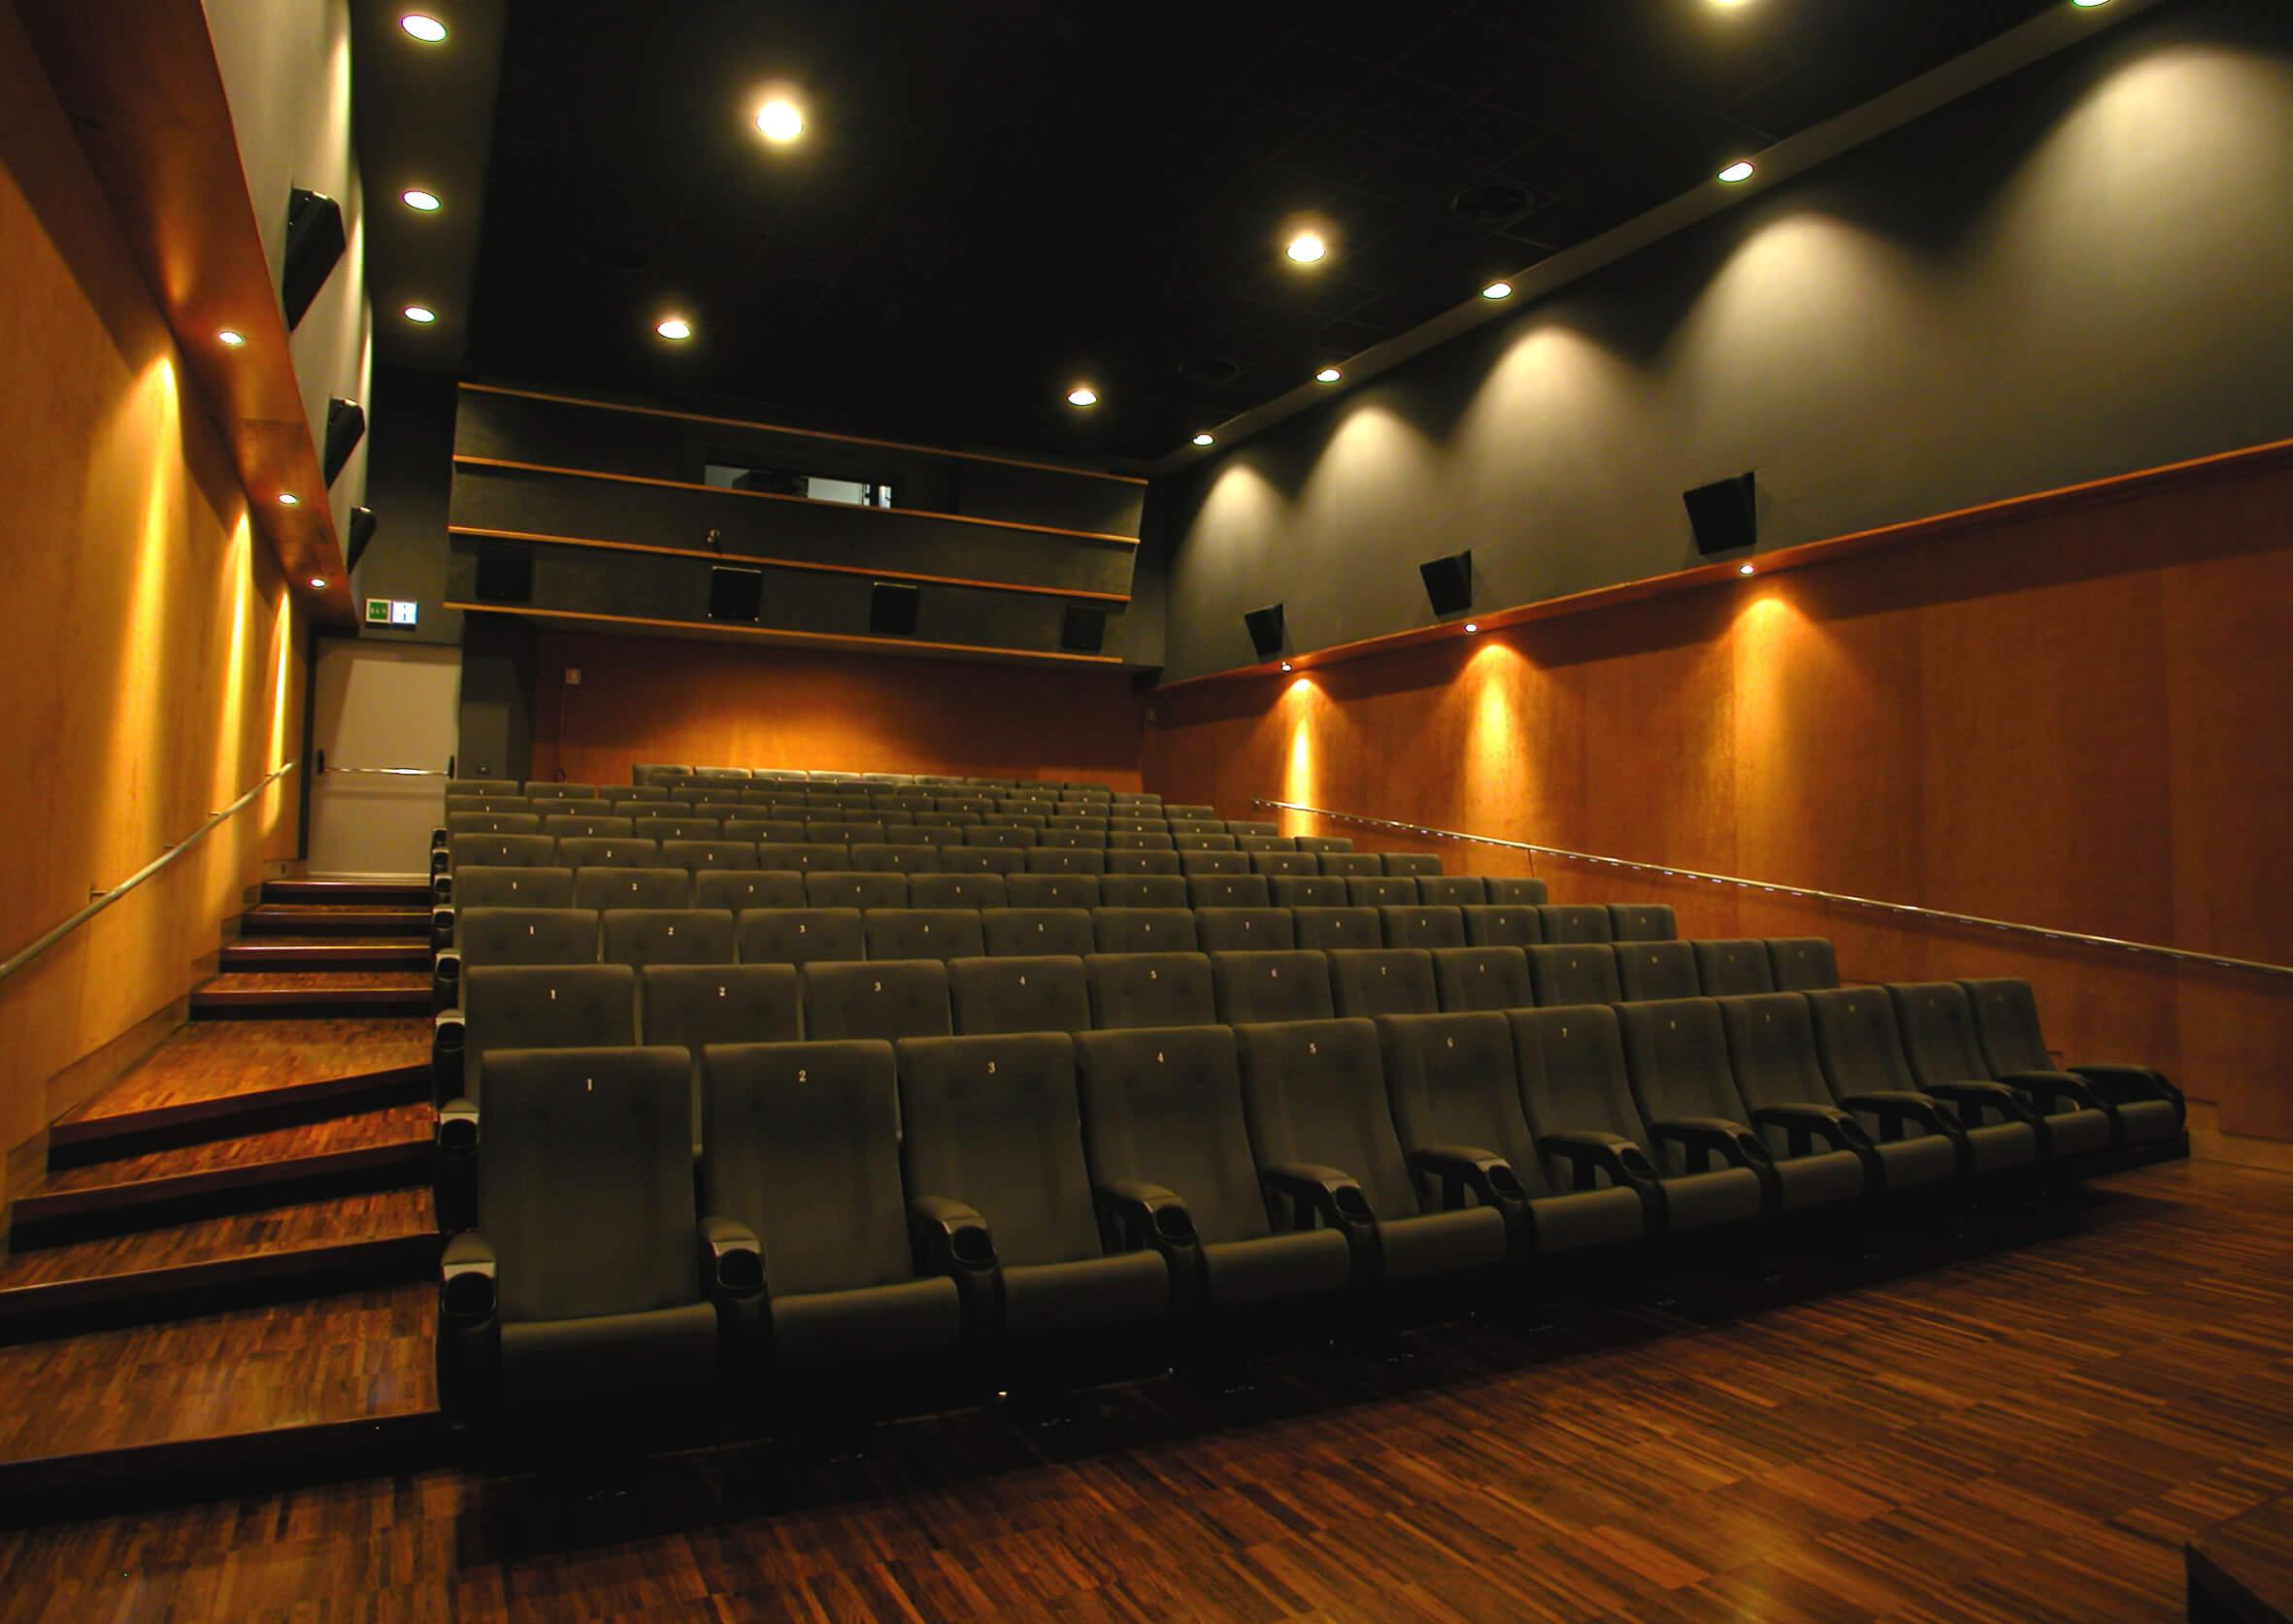 sala cinema tappezzeria d'arredamento Acilia Roma